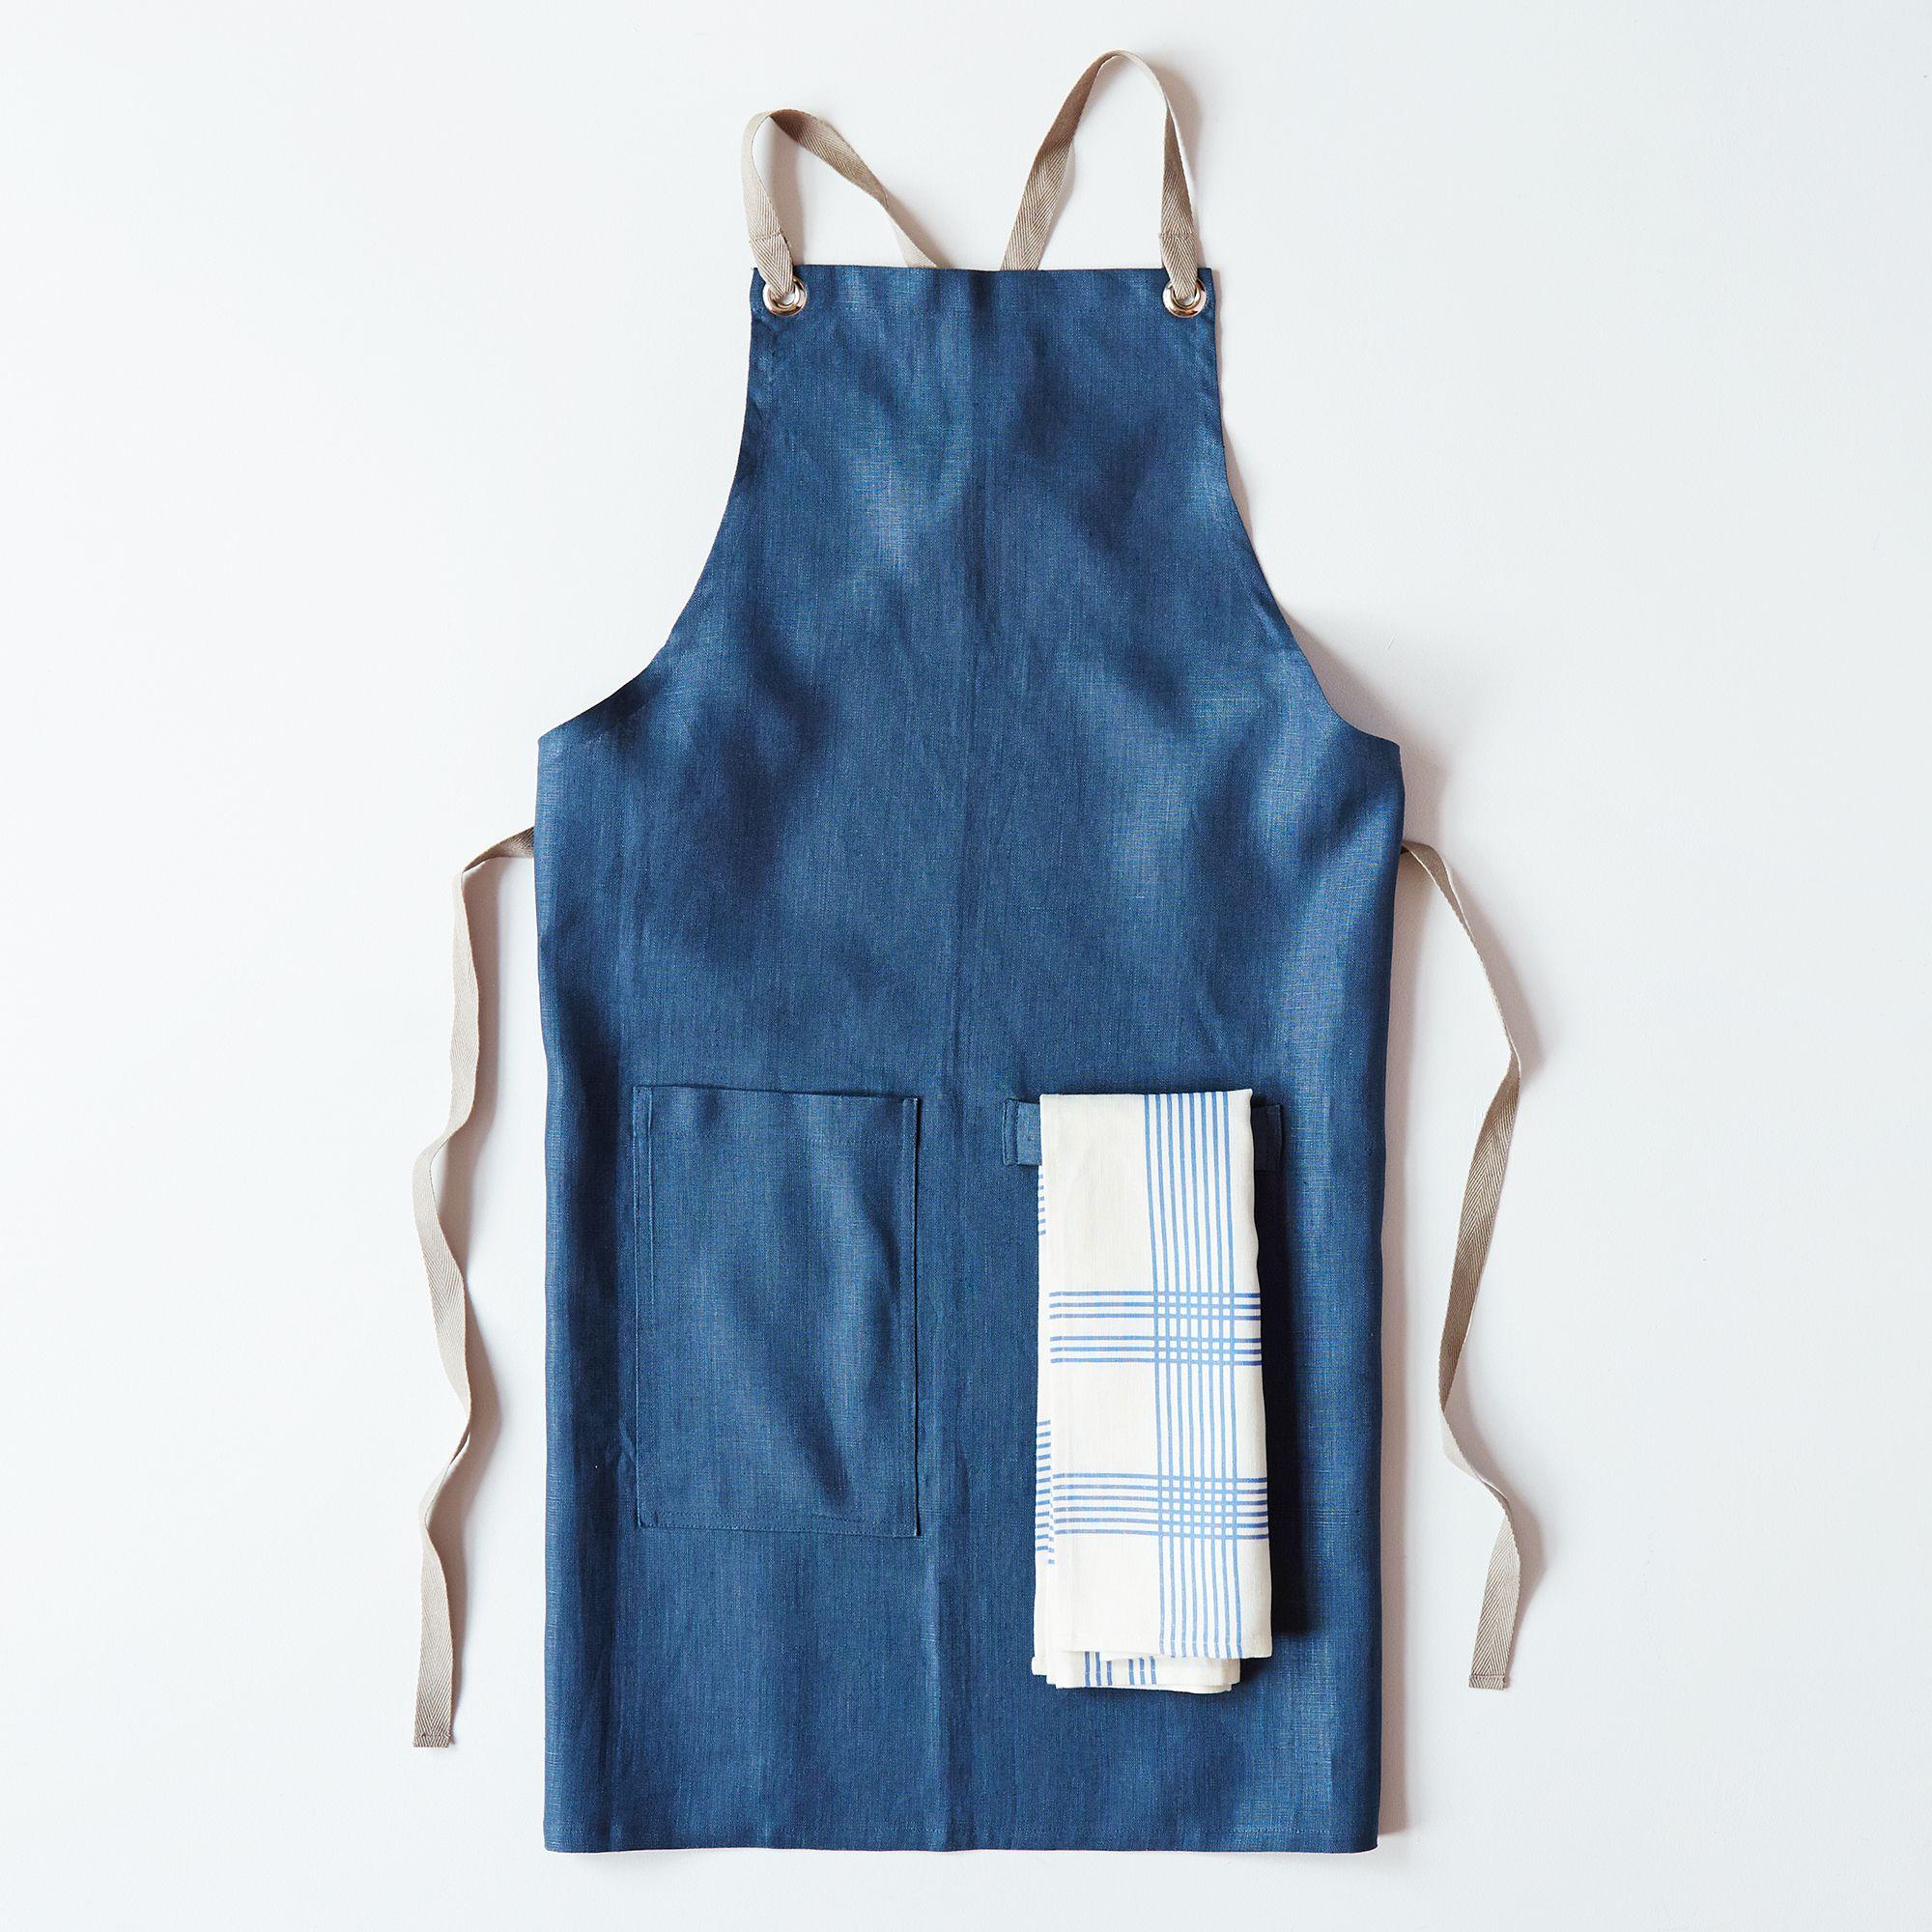 024912b8 061f 4330 8ad6 a43001ec38fb  studio patro slate blue apron provisions mark weinberg 31 10 14 0506 silo